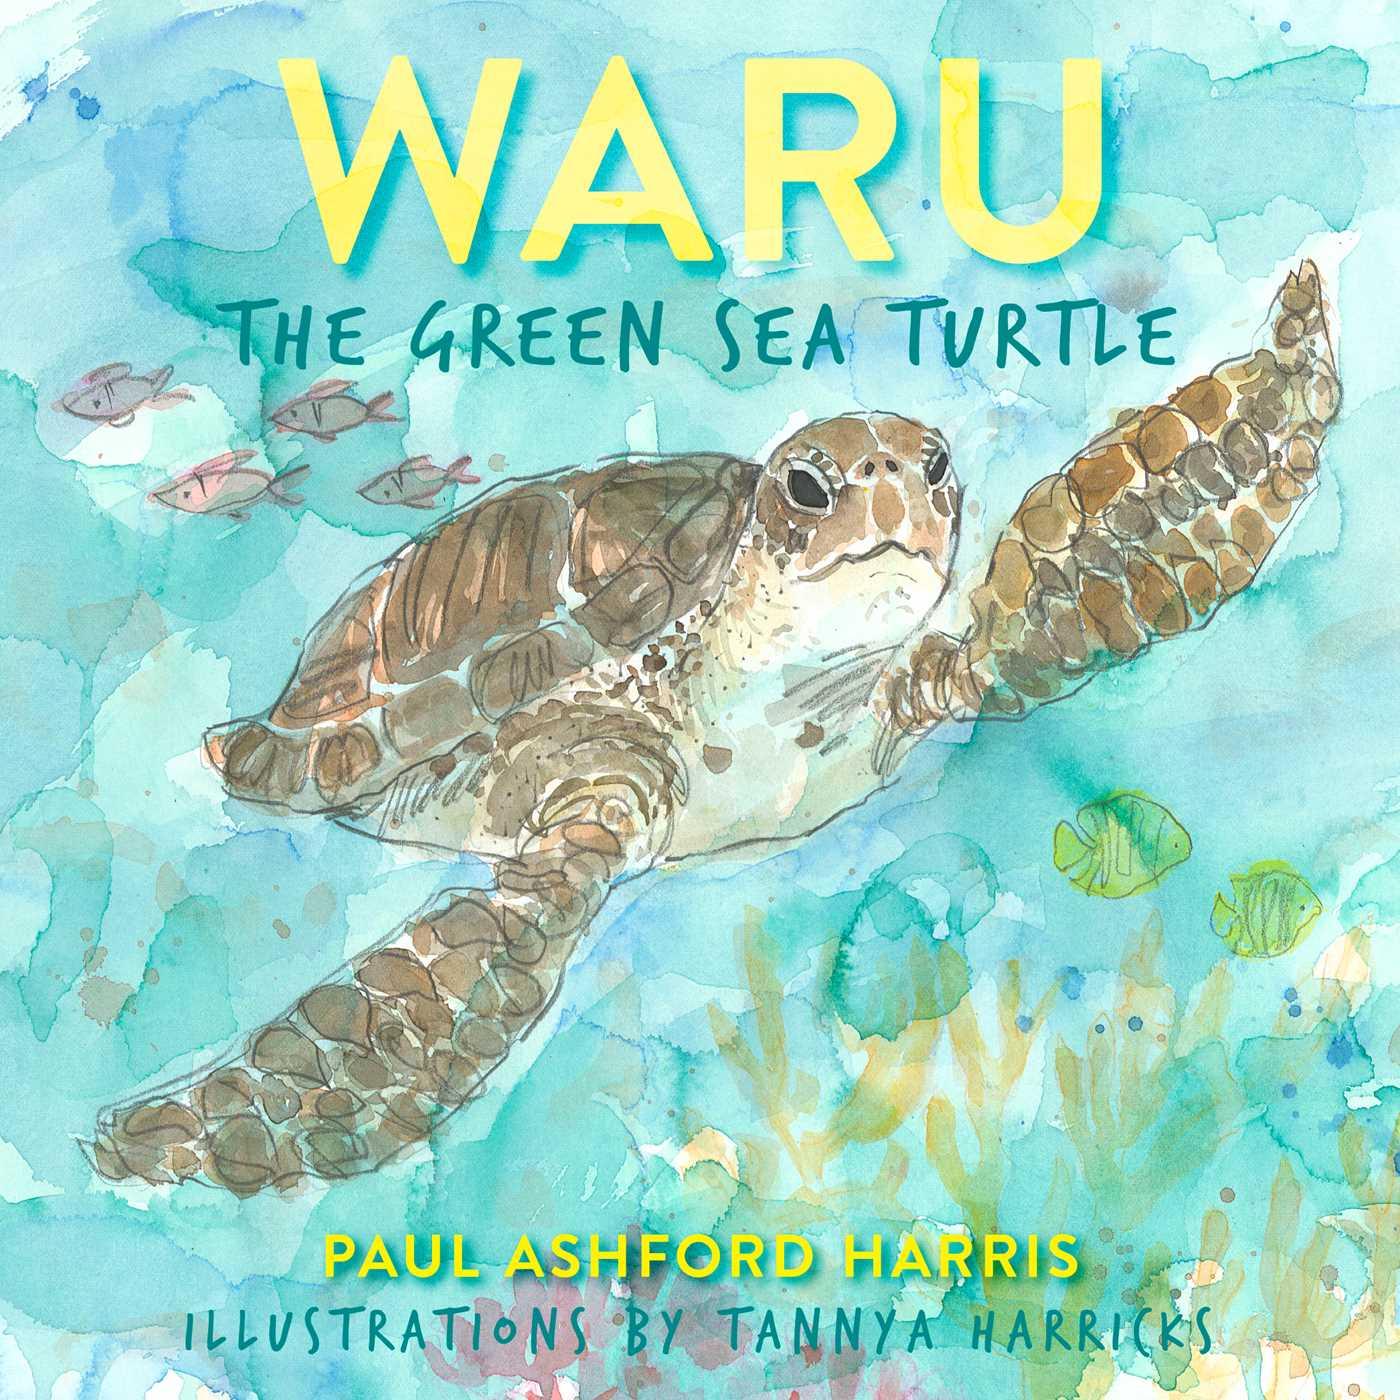 waru-the-green-sea-turtle-9781925384314_hr.jpg